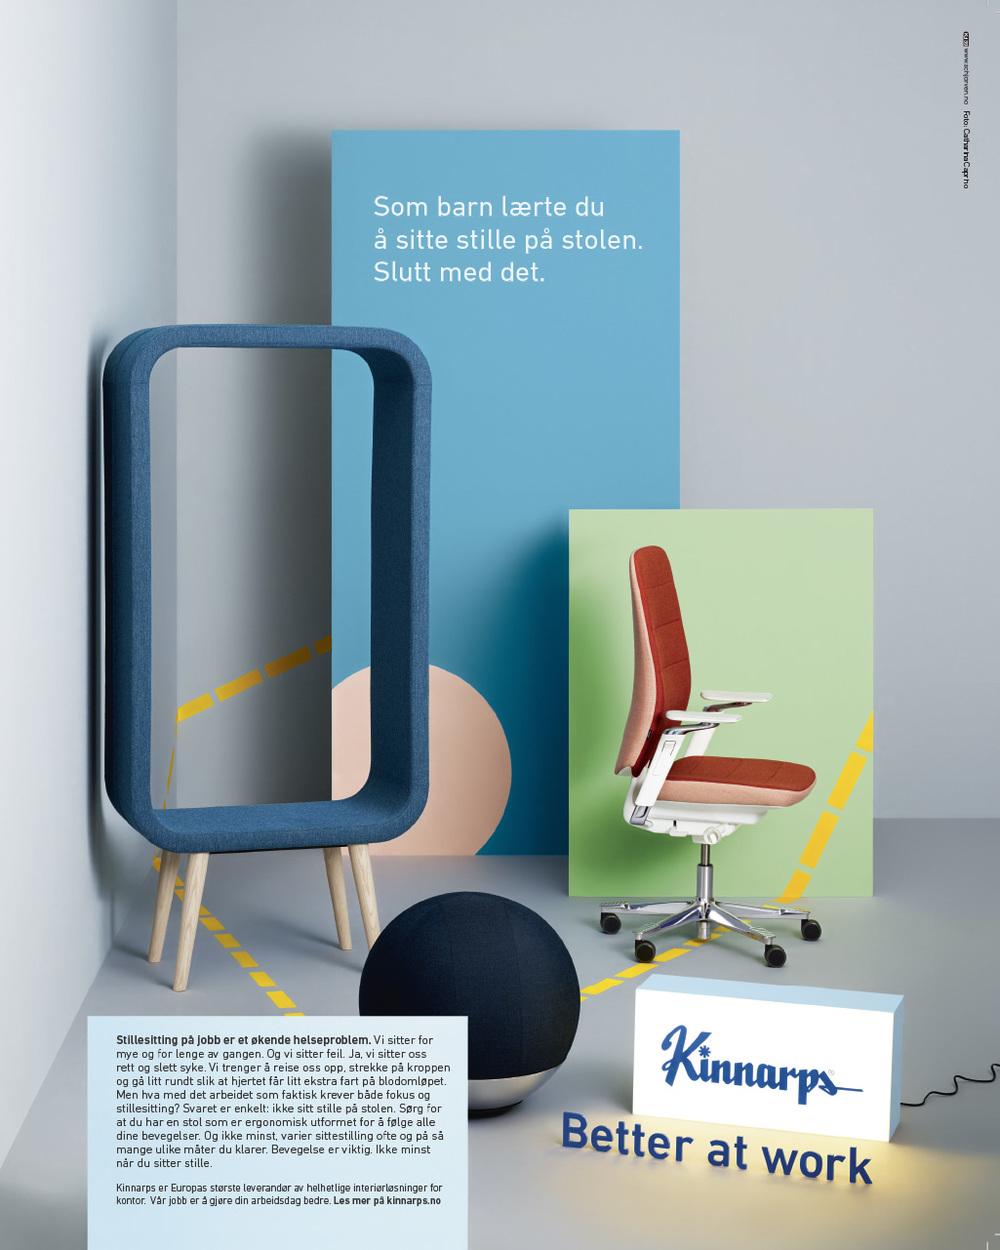 Kinnarps / Schjærven